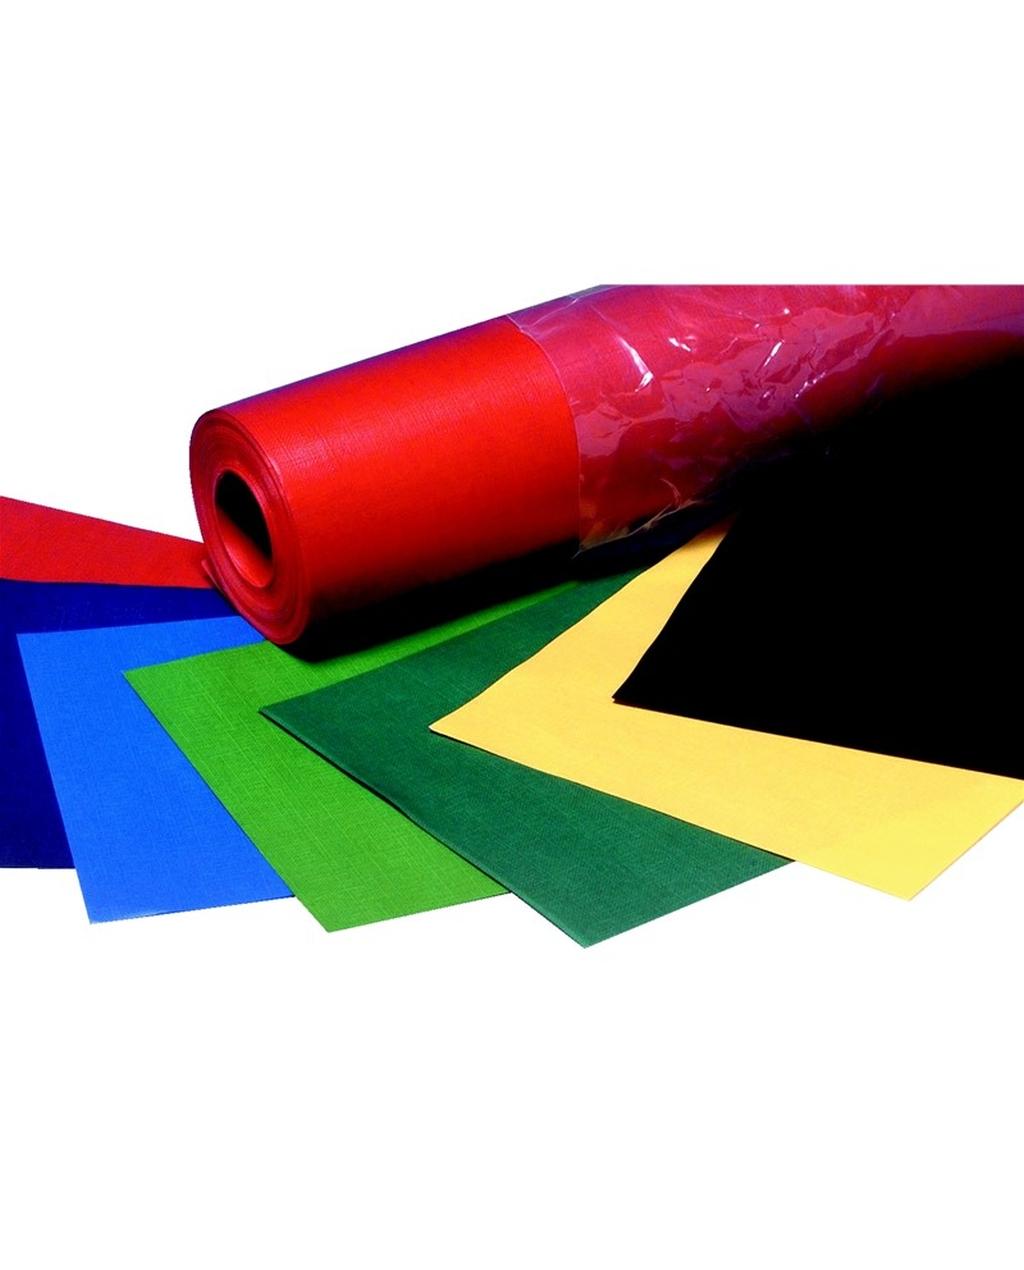 Durafrieze Roll 1020mm x 25m 100gsm - Black